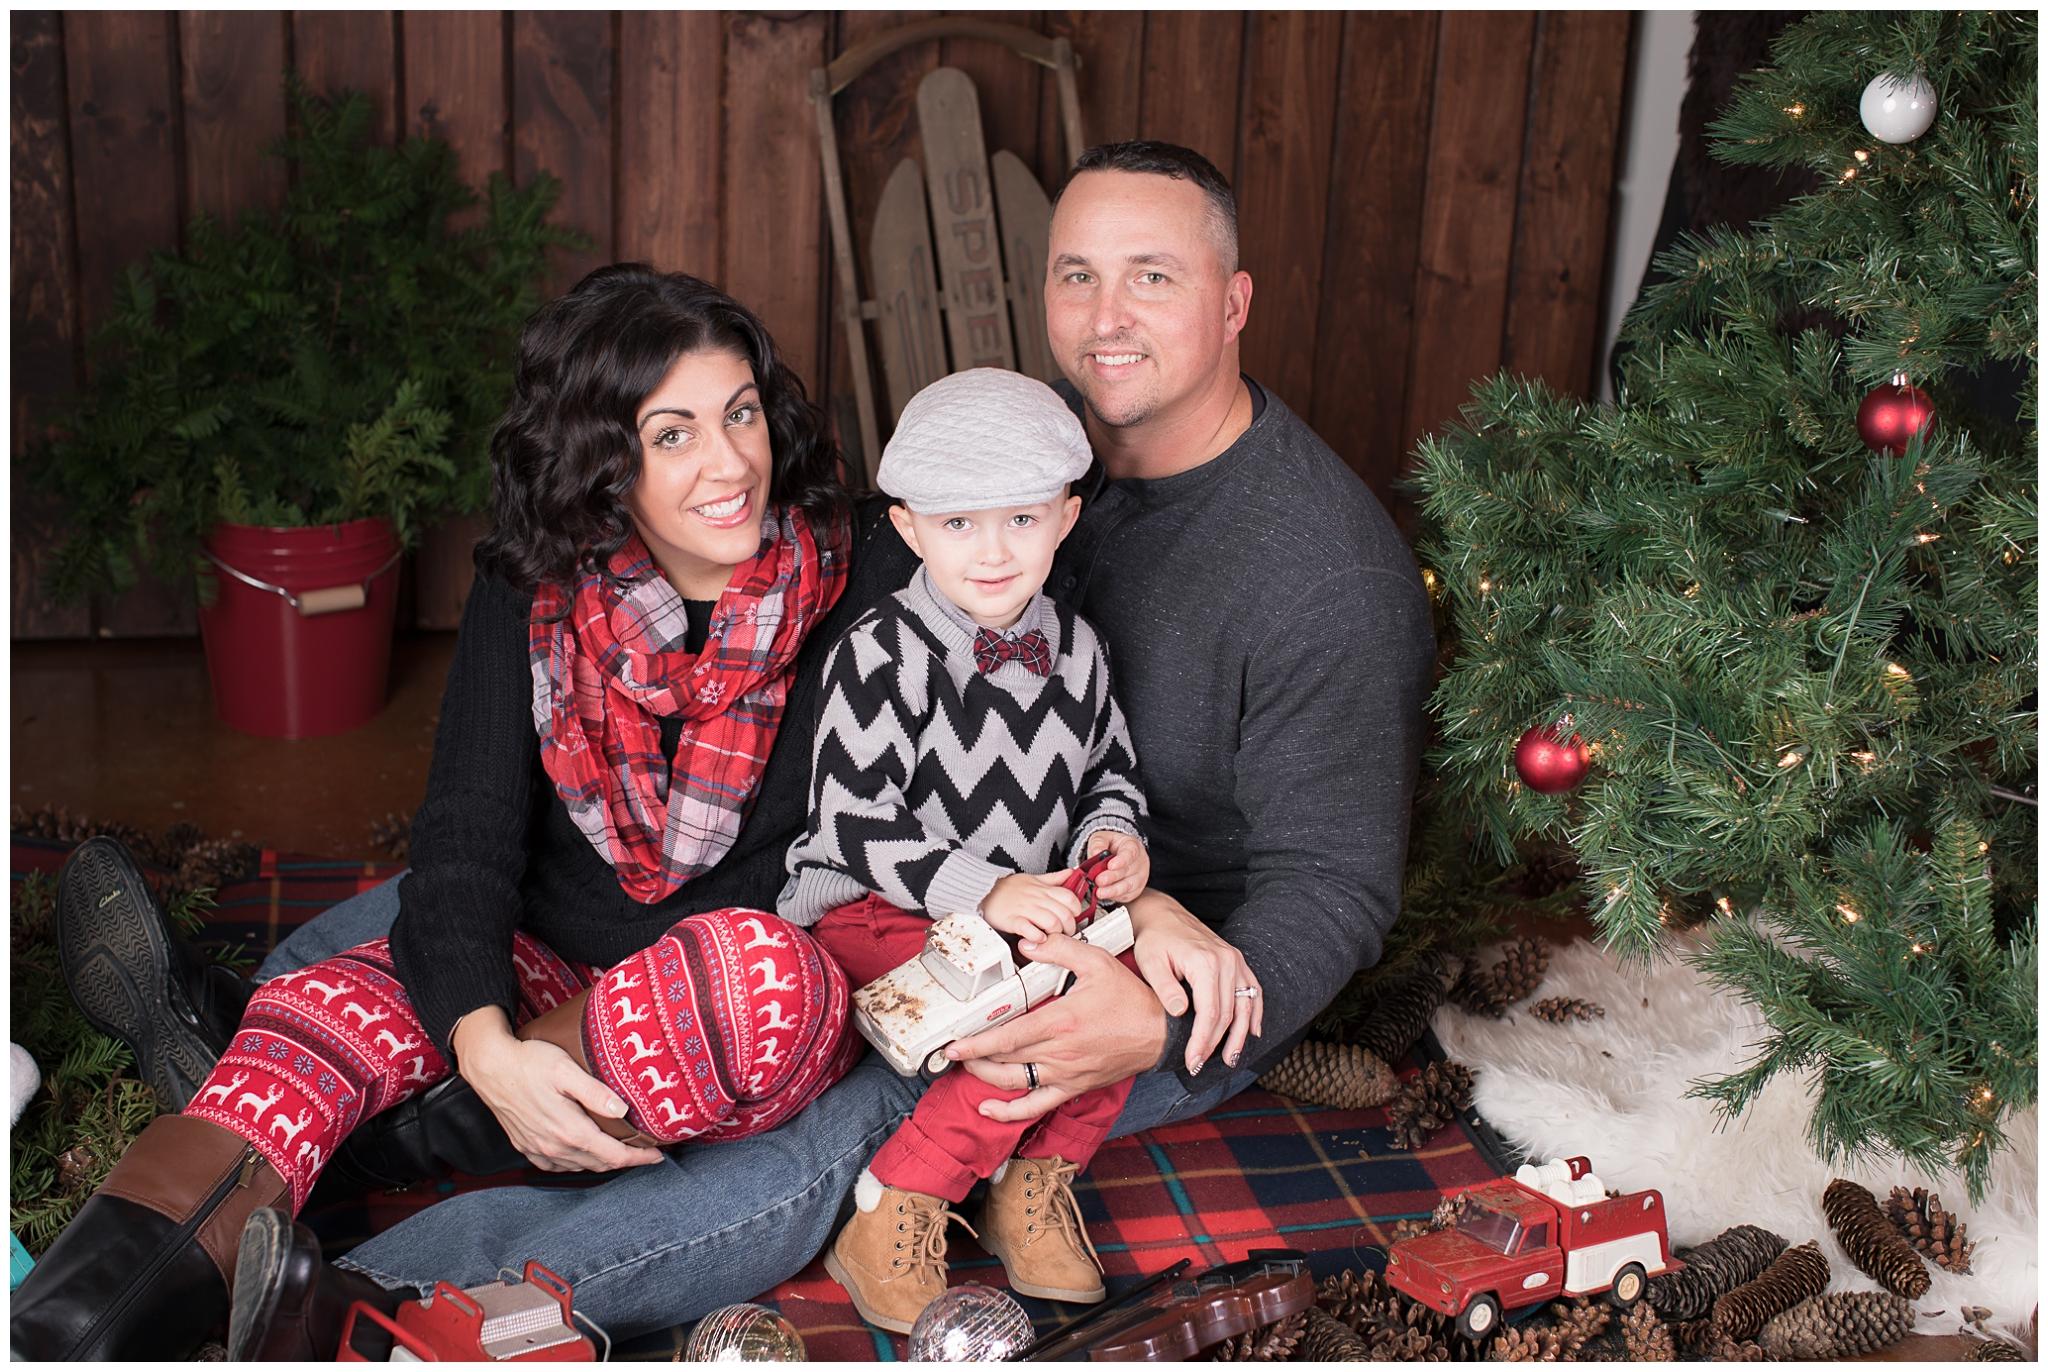 ChristmasMiniSessions_family-baby-kids_Berks-County-Reading-PA_0025.jpg